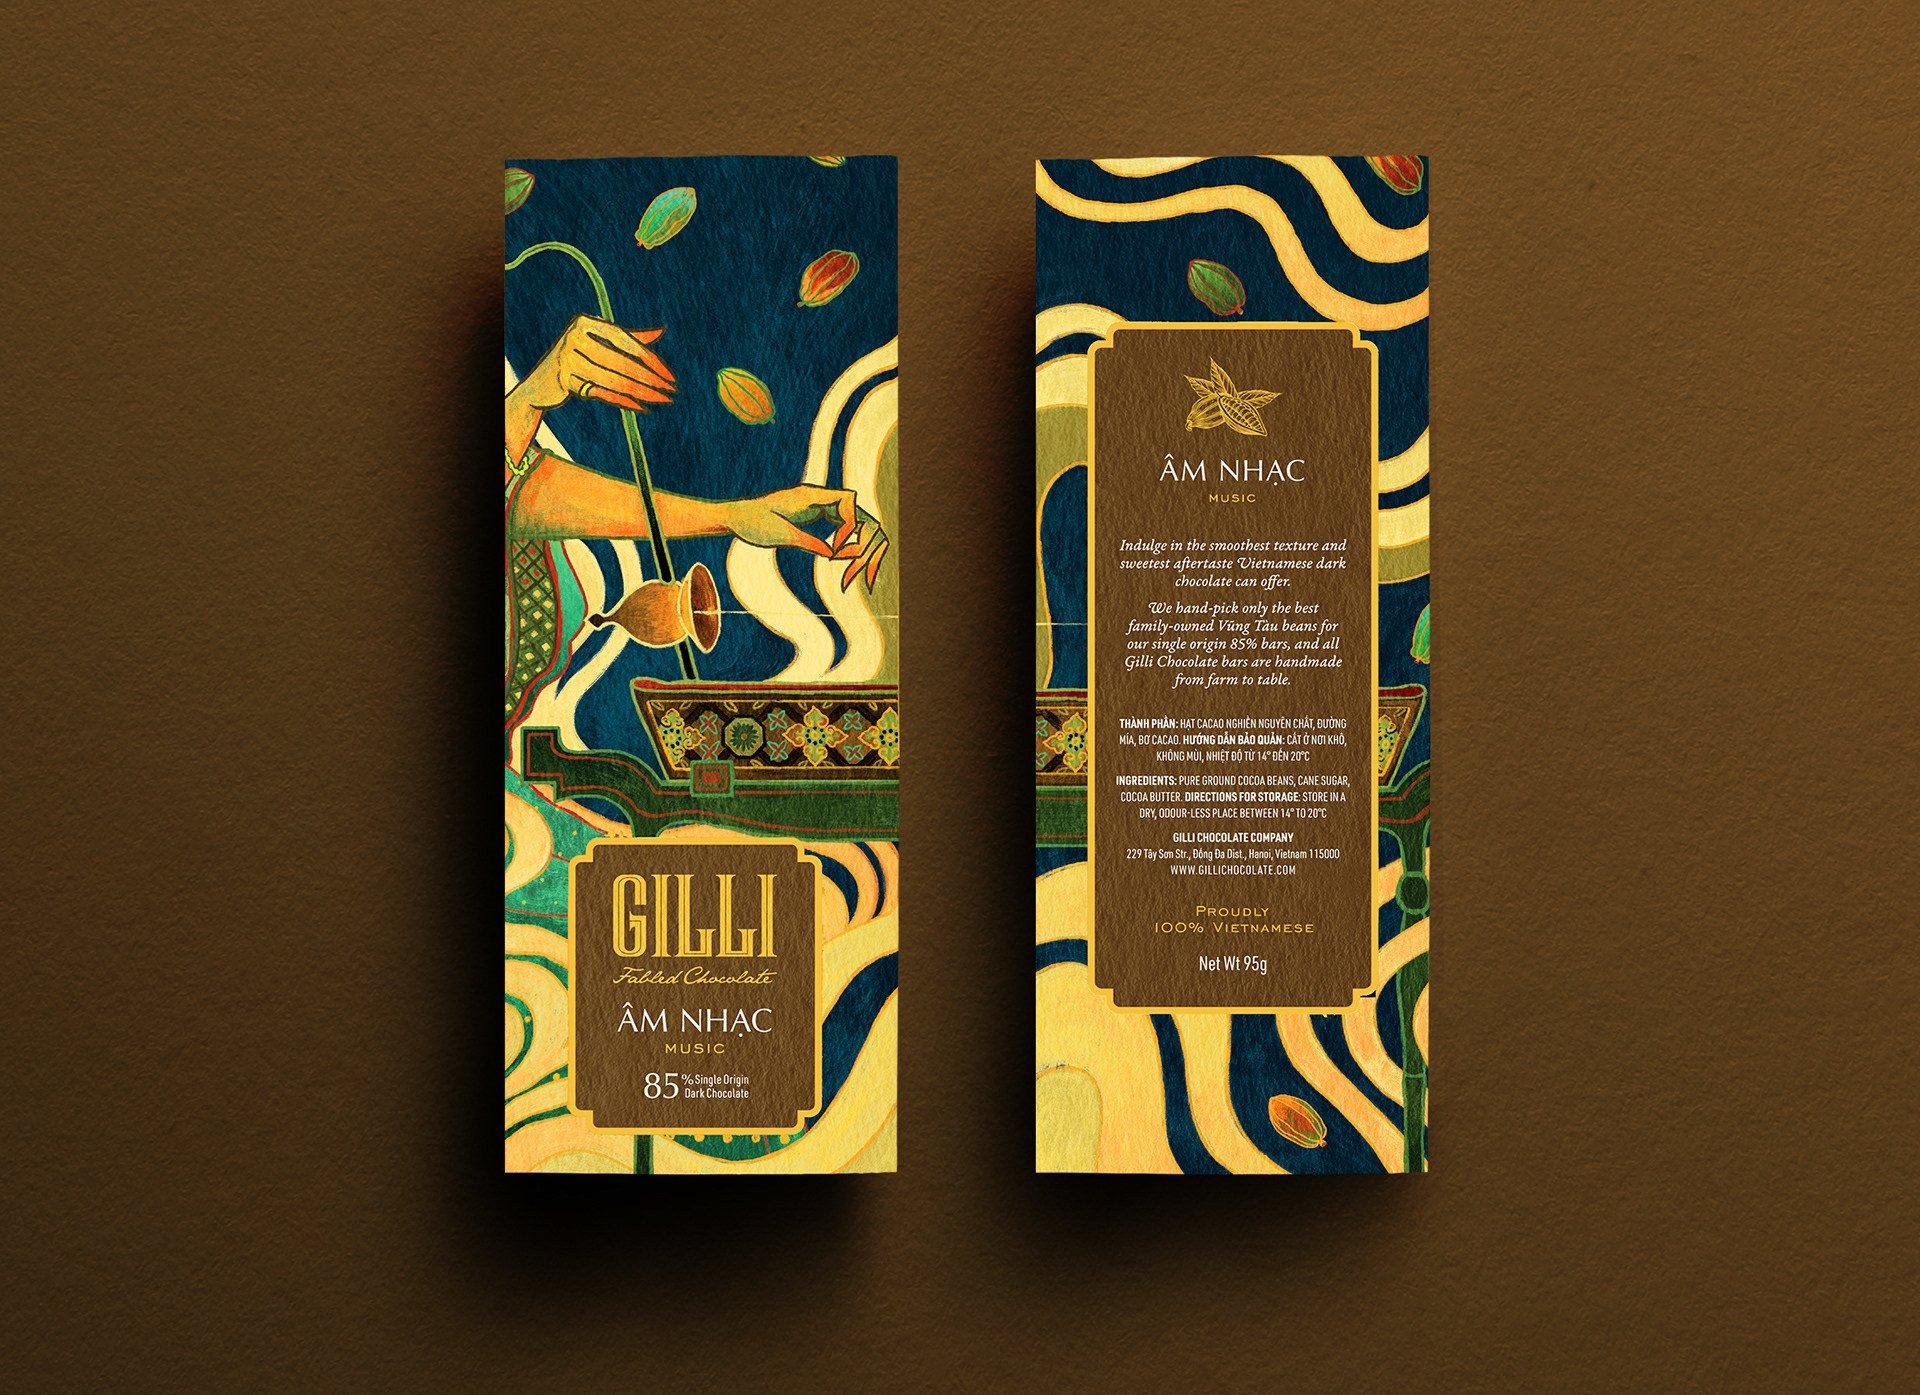 in hộp chocolate giá rẻ tai IBN